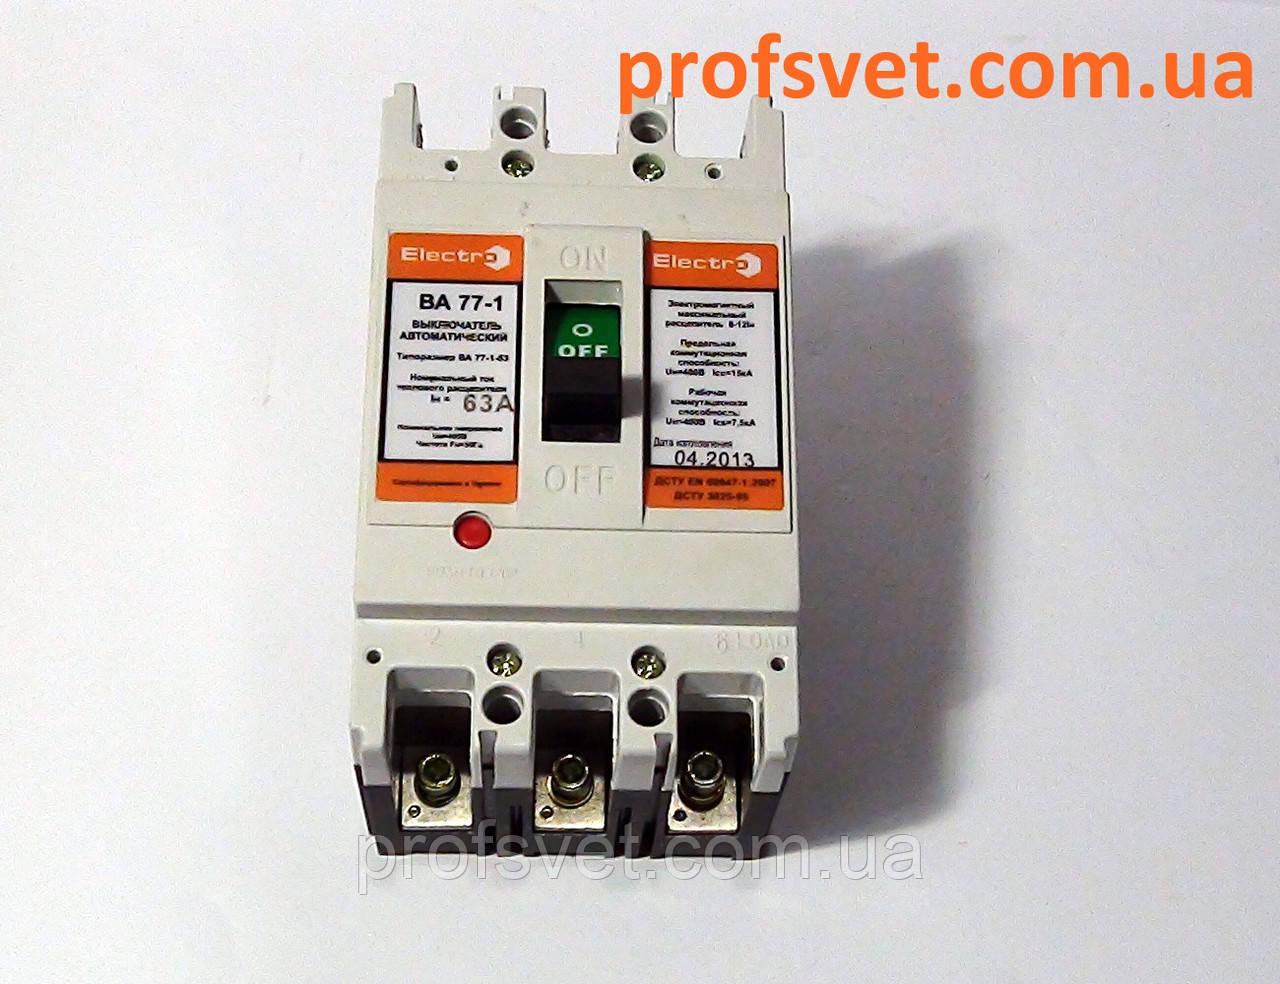 Автоматичний вимикач ВА-77 40А щитової